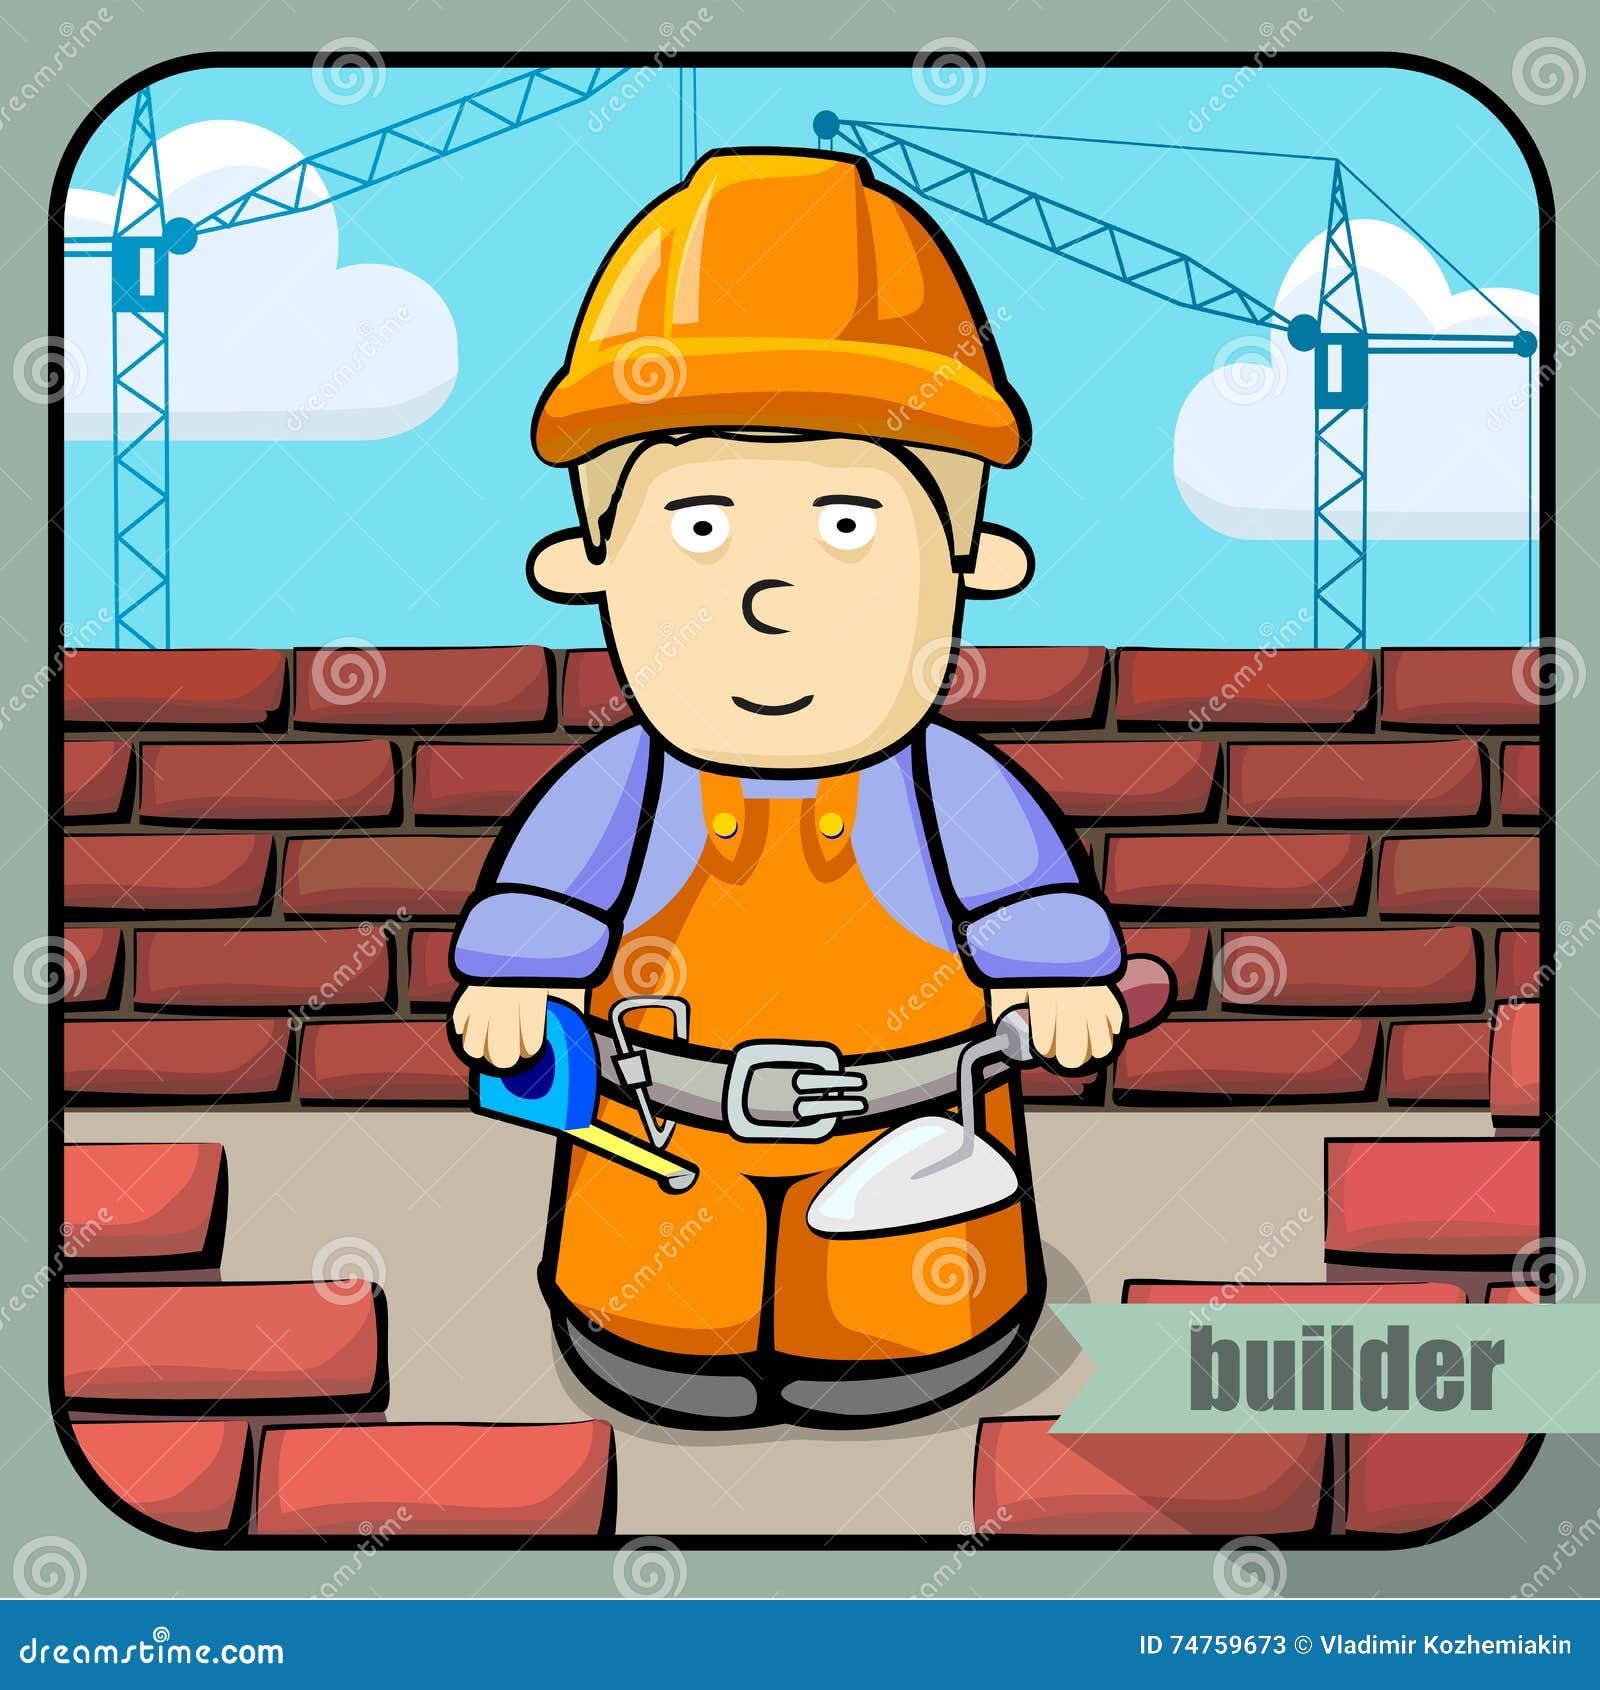 person profession builder stock vector illustration of icon 74759673 rh dreamstime com Rustic Fence Vector Vector Fence Post